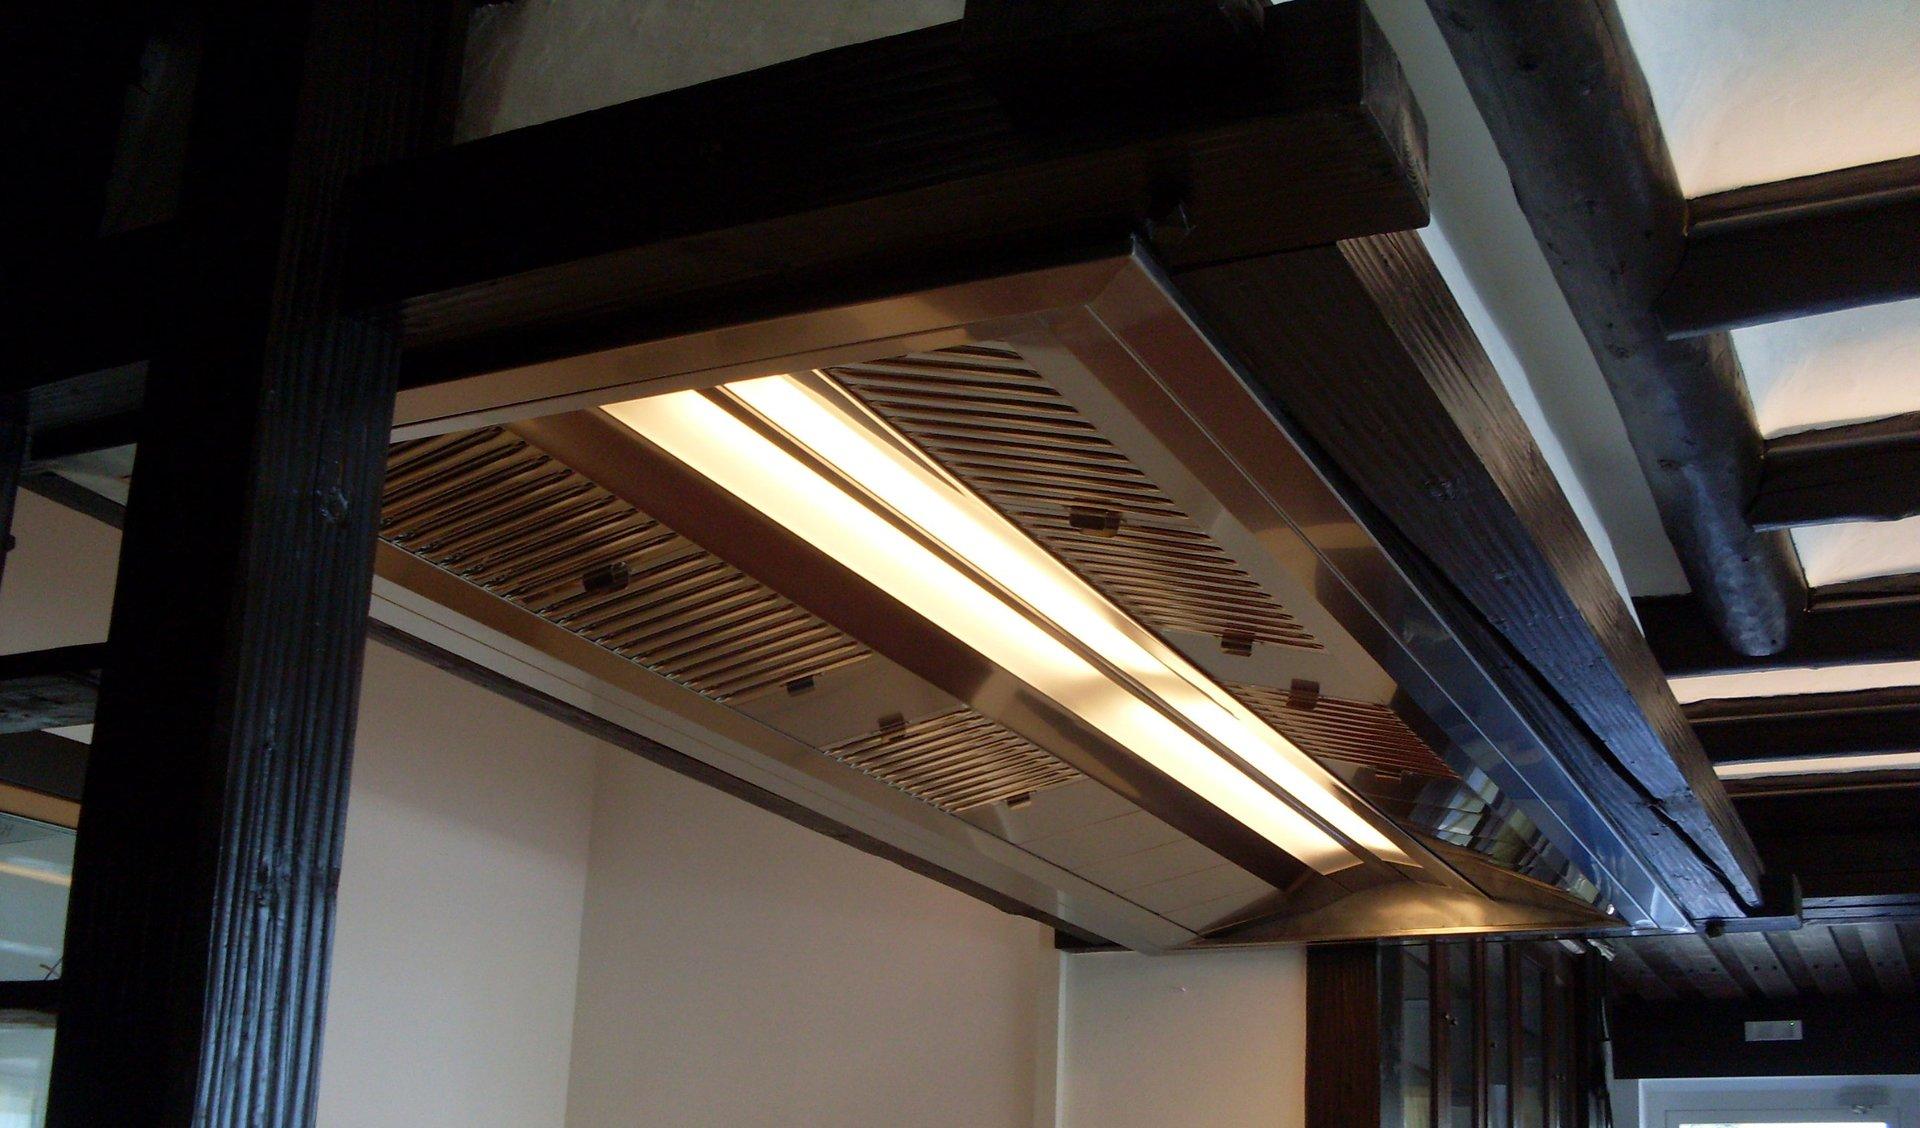 abzugshauben f r k chen leifers bz termogeneral. Black Bedroom Furniture Sets. Home Design Ideas